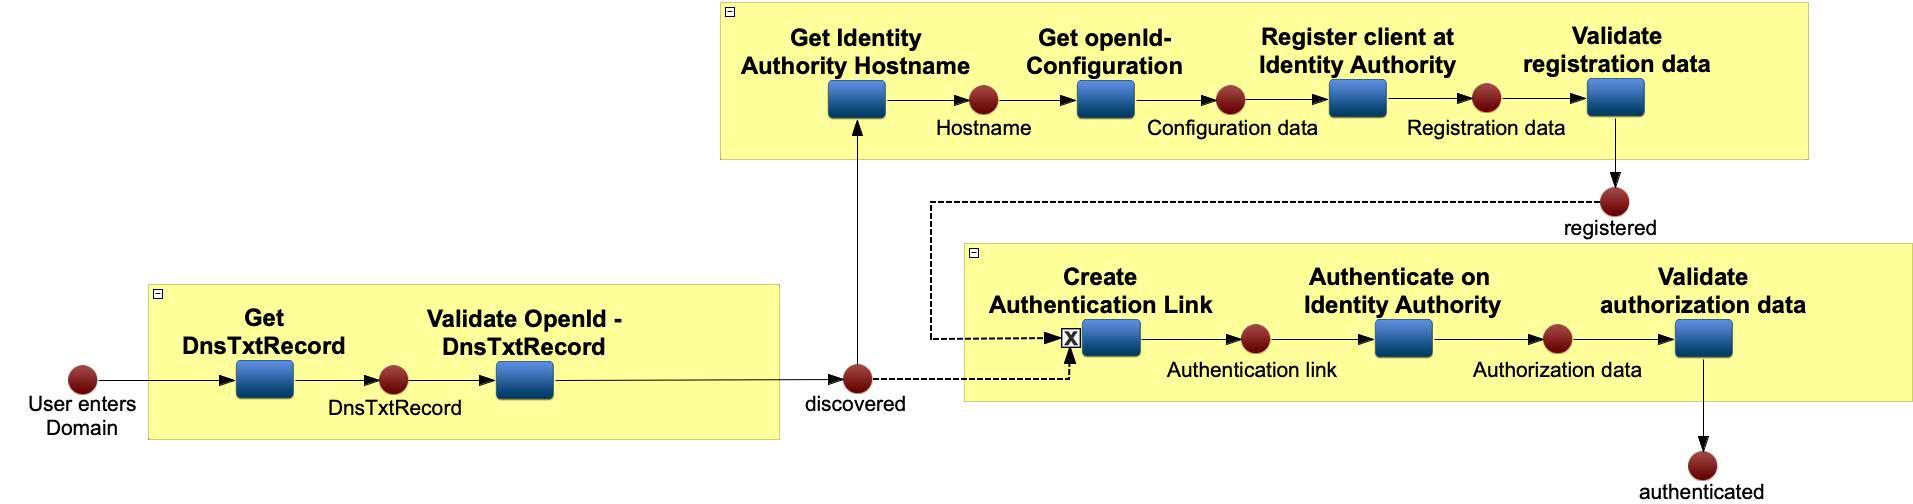 id4Me library process image (Petri-Netz)